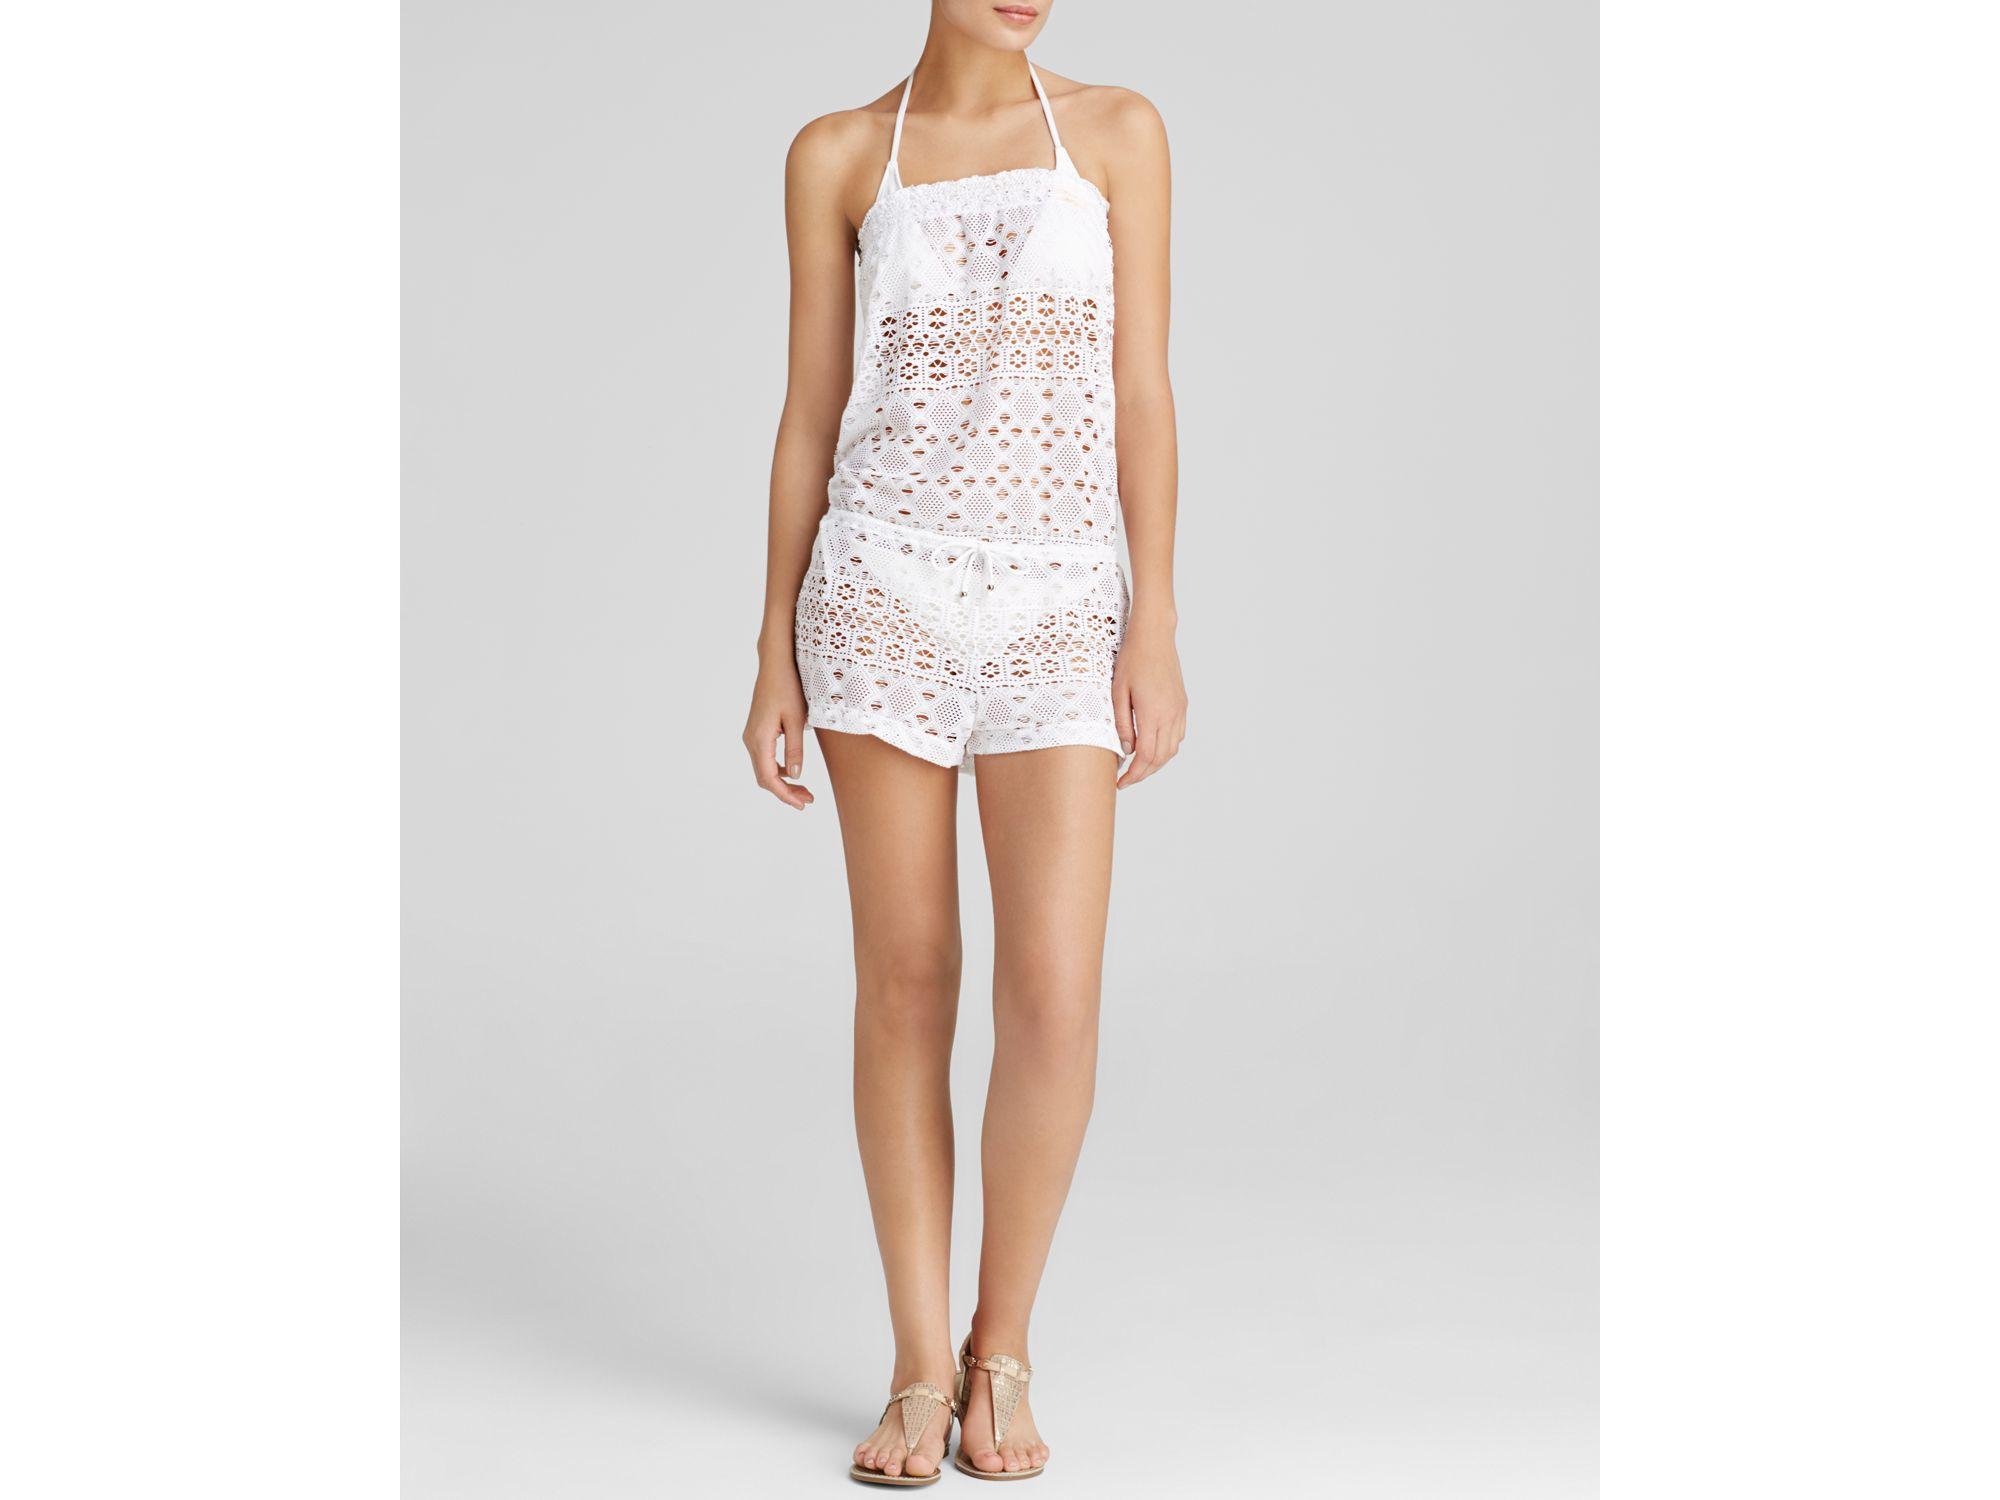 9ec11de1118f7 Lyst - Ralph Lauren Polo Crochet Swim Cover Up Romper in White